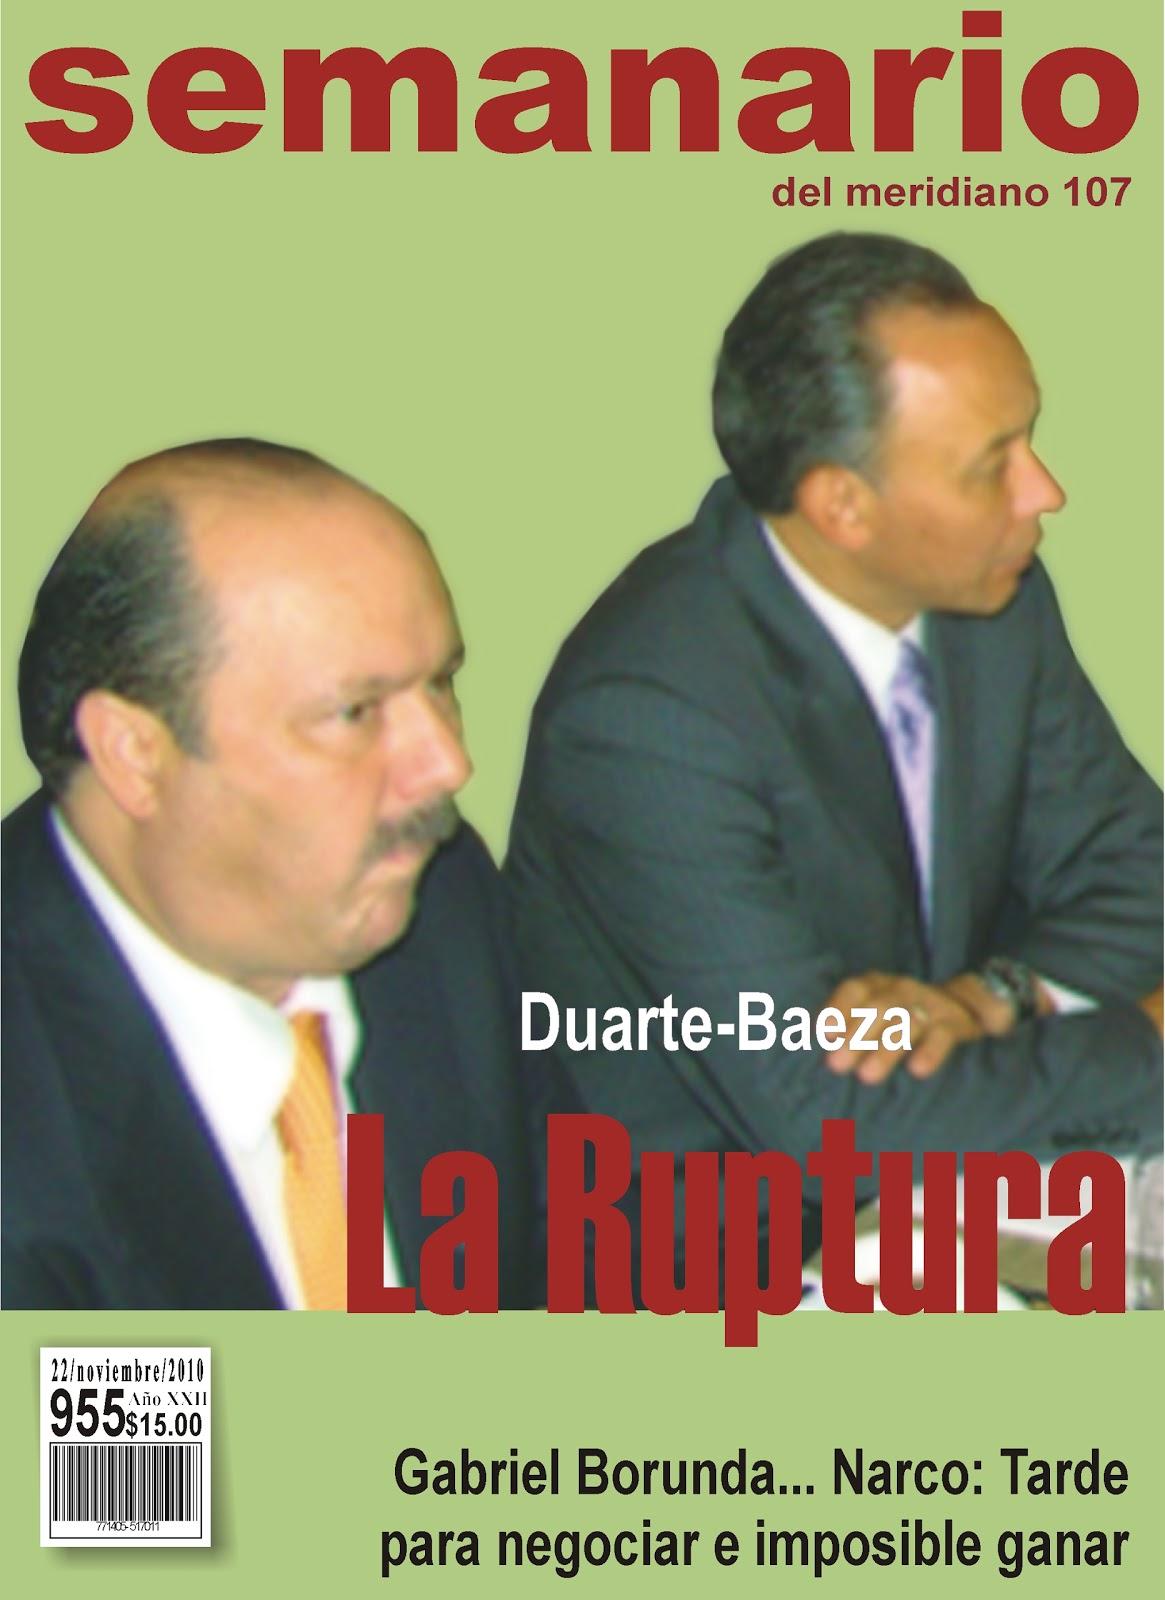 http://1.bp.blogspot.com/_PWGnA4ERQXU/TOqlOw5mtcI/AAAAAAAABFU/L_5cO4unRrQ/s1600/portada+inicial955.jpg